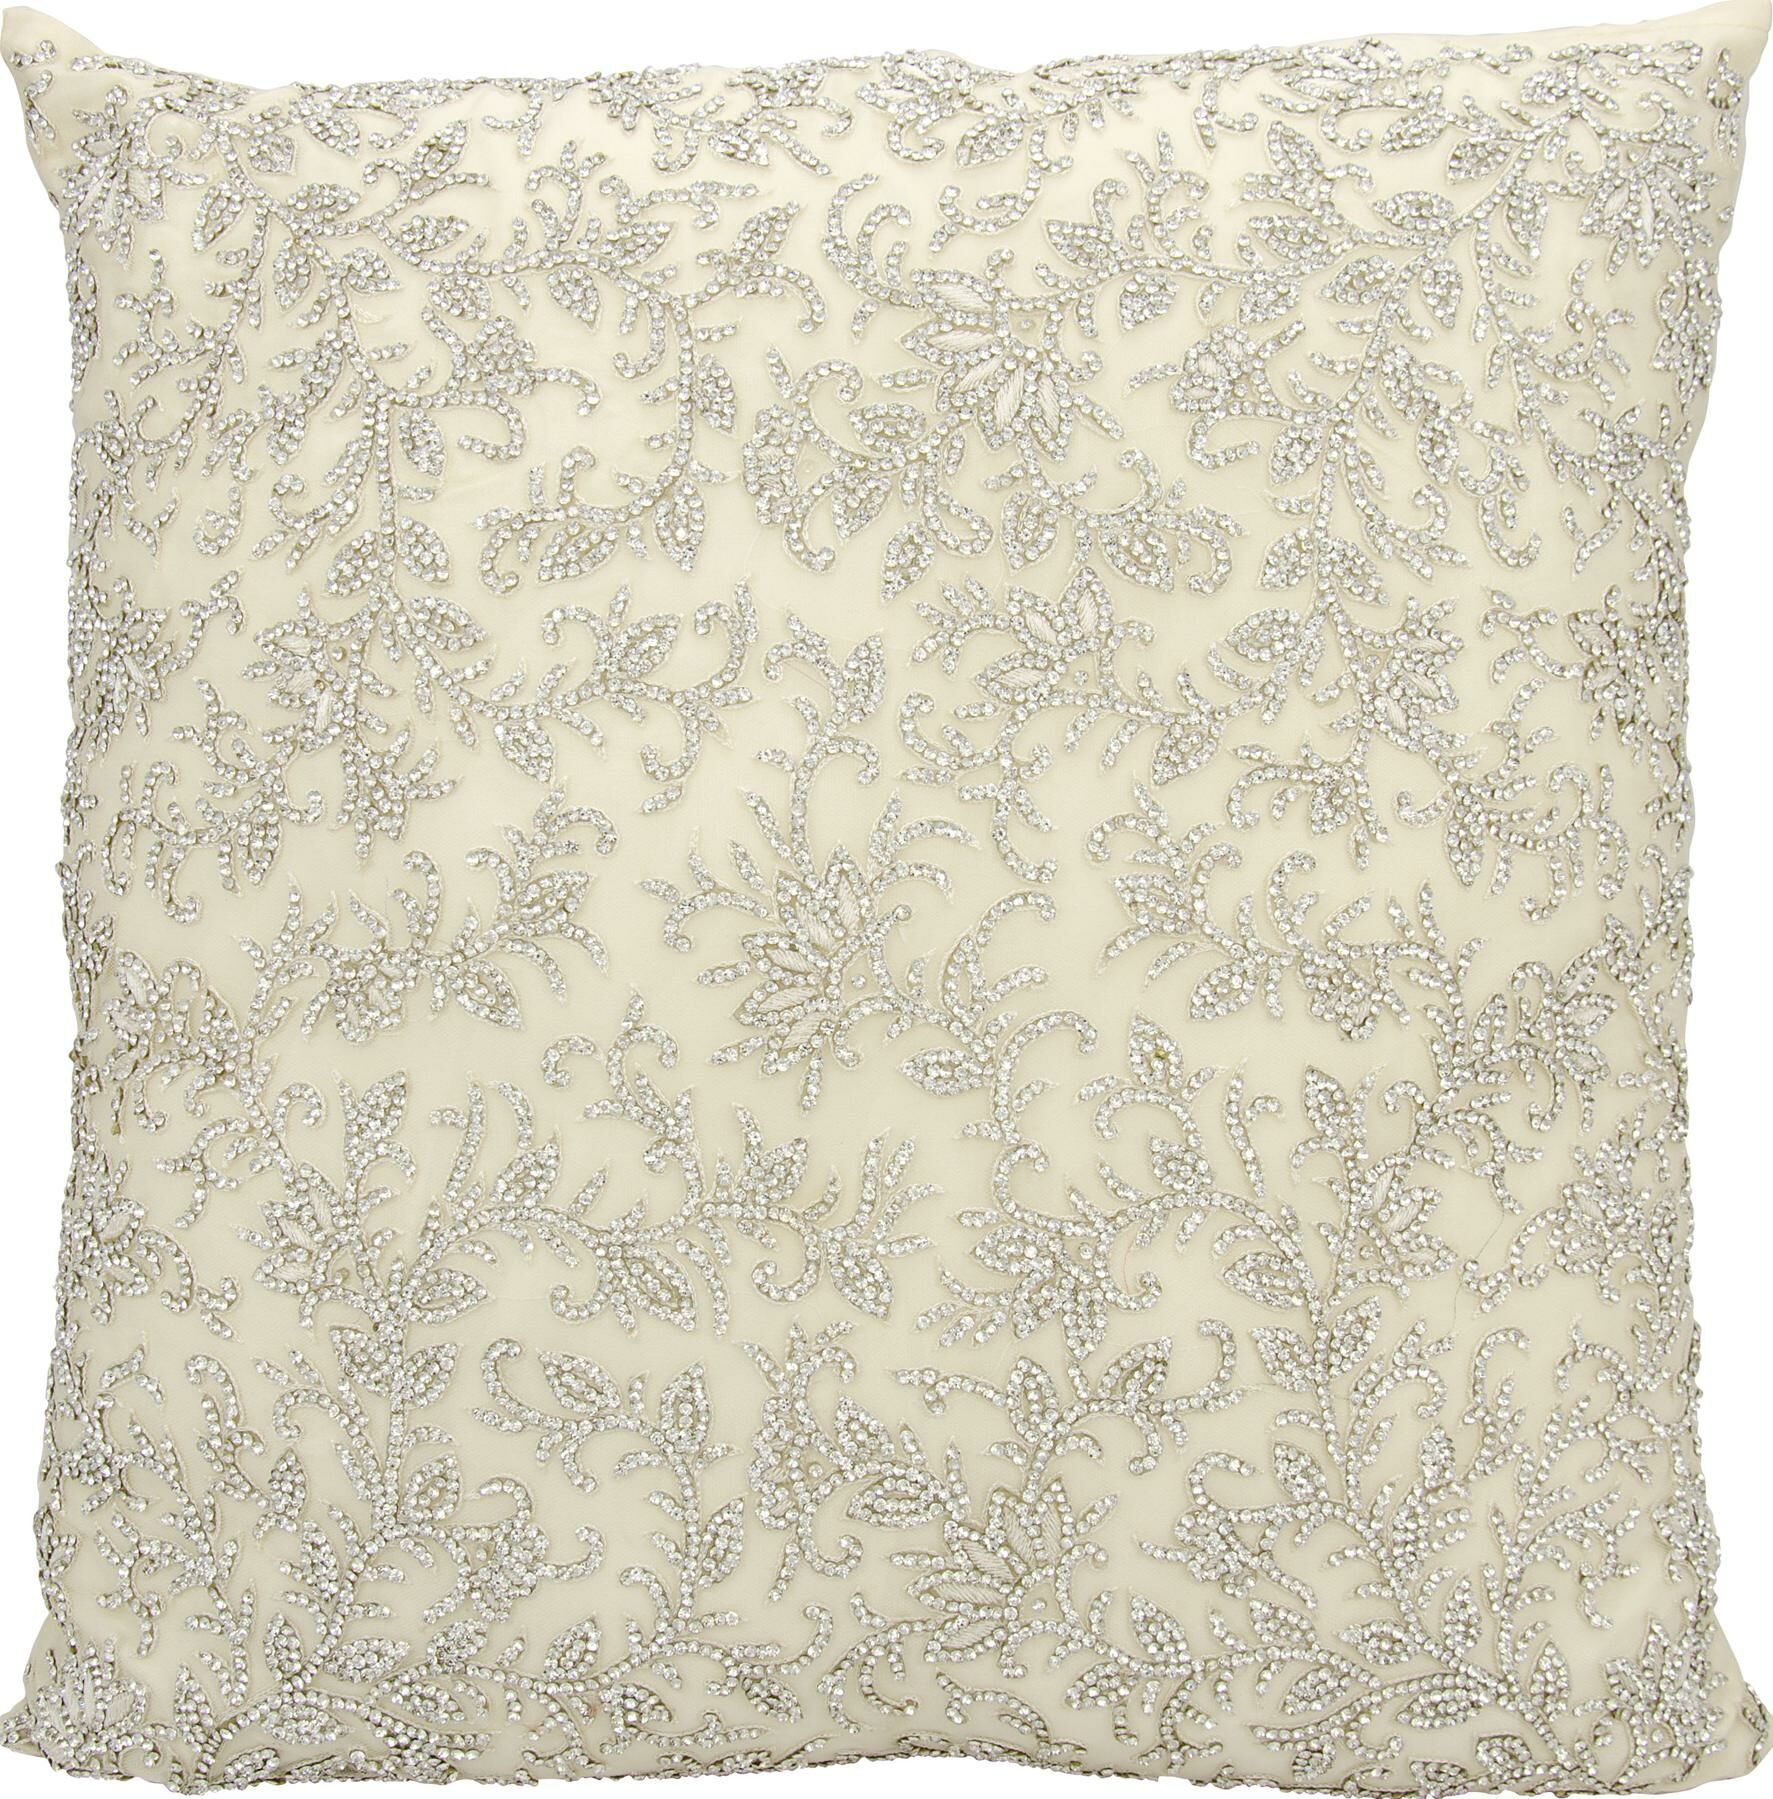 Gemstone Satin Throw Pillow